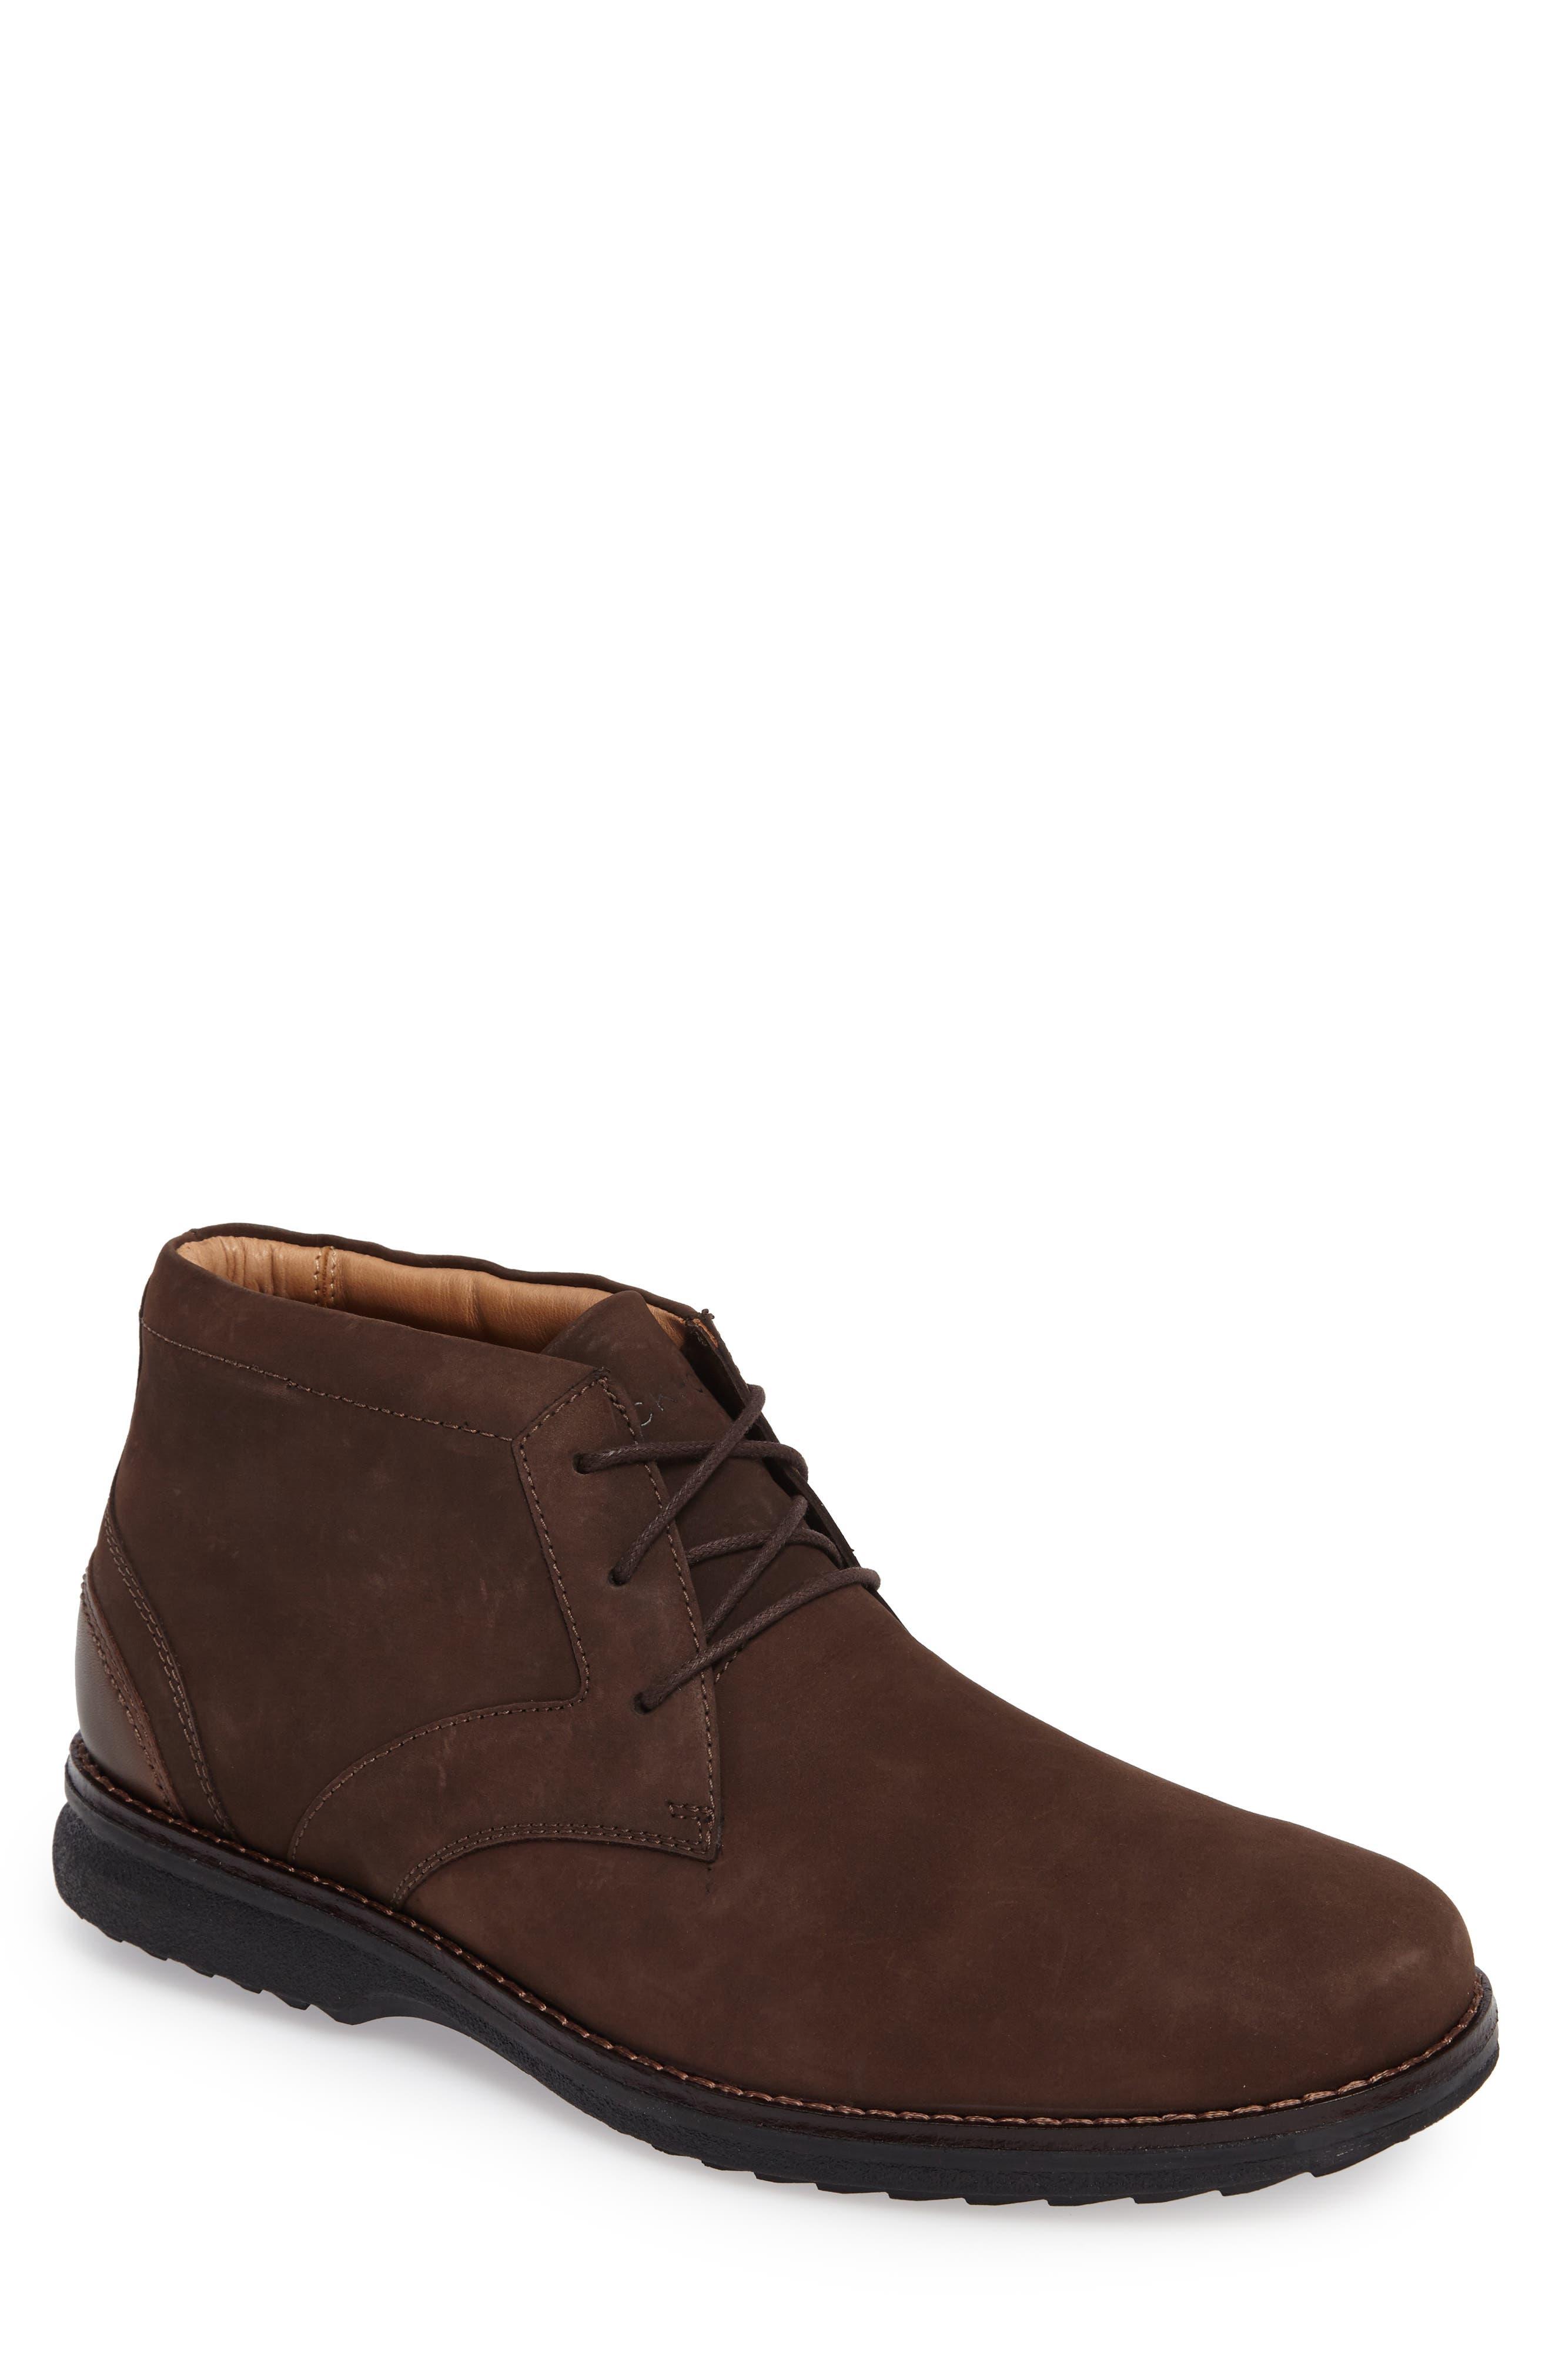 Premium Class Chukka Boot,                         Main,                         color,